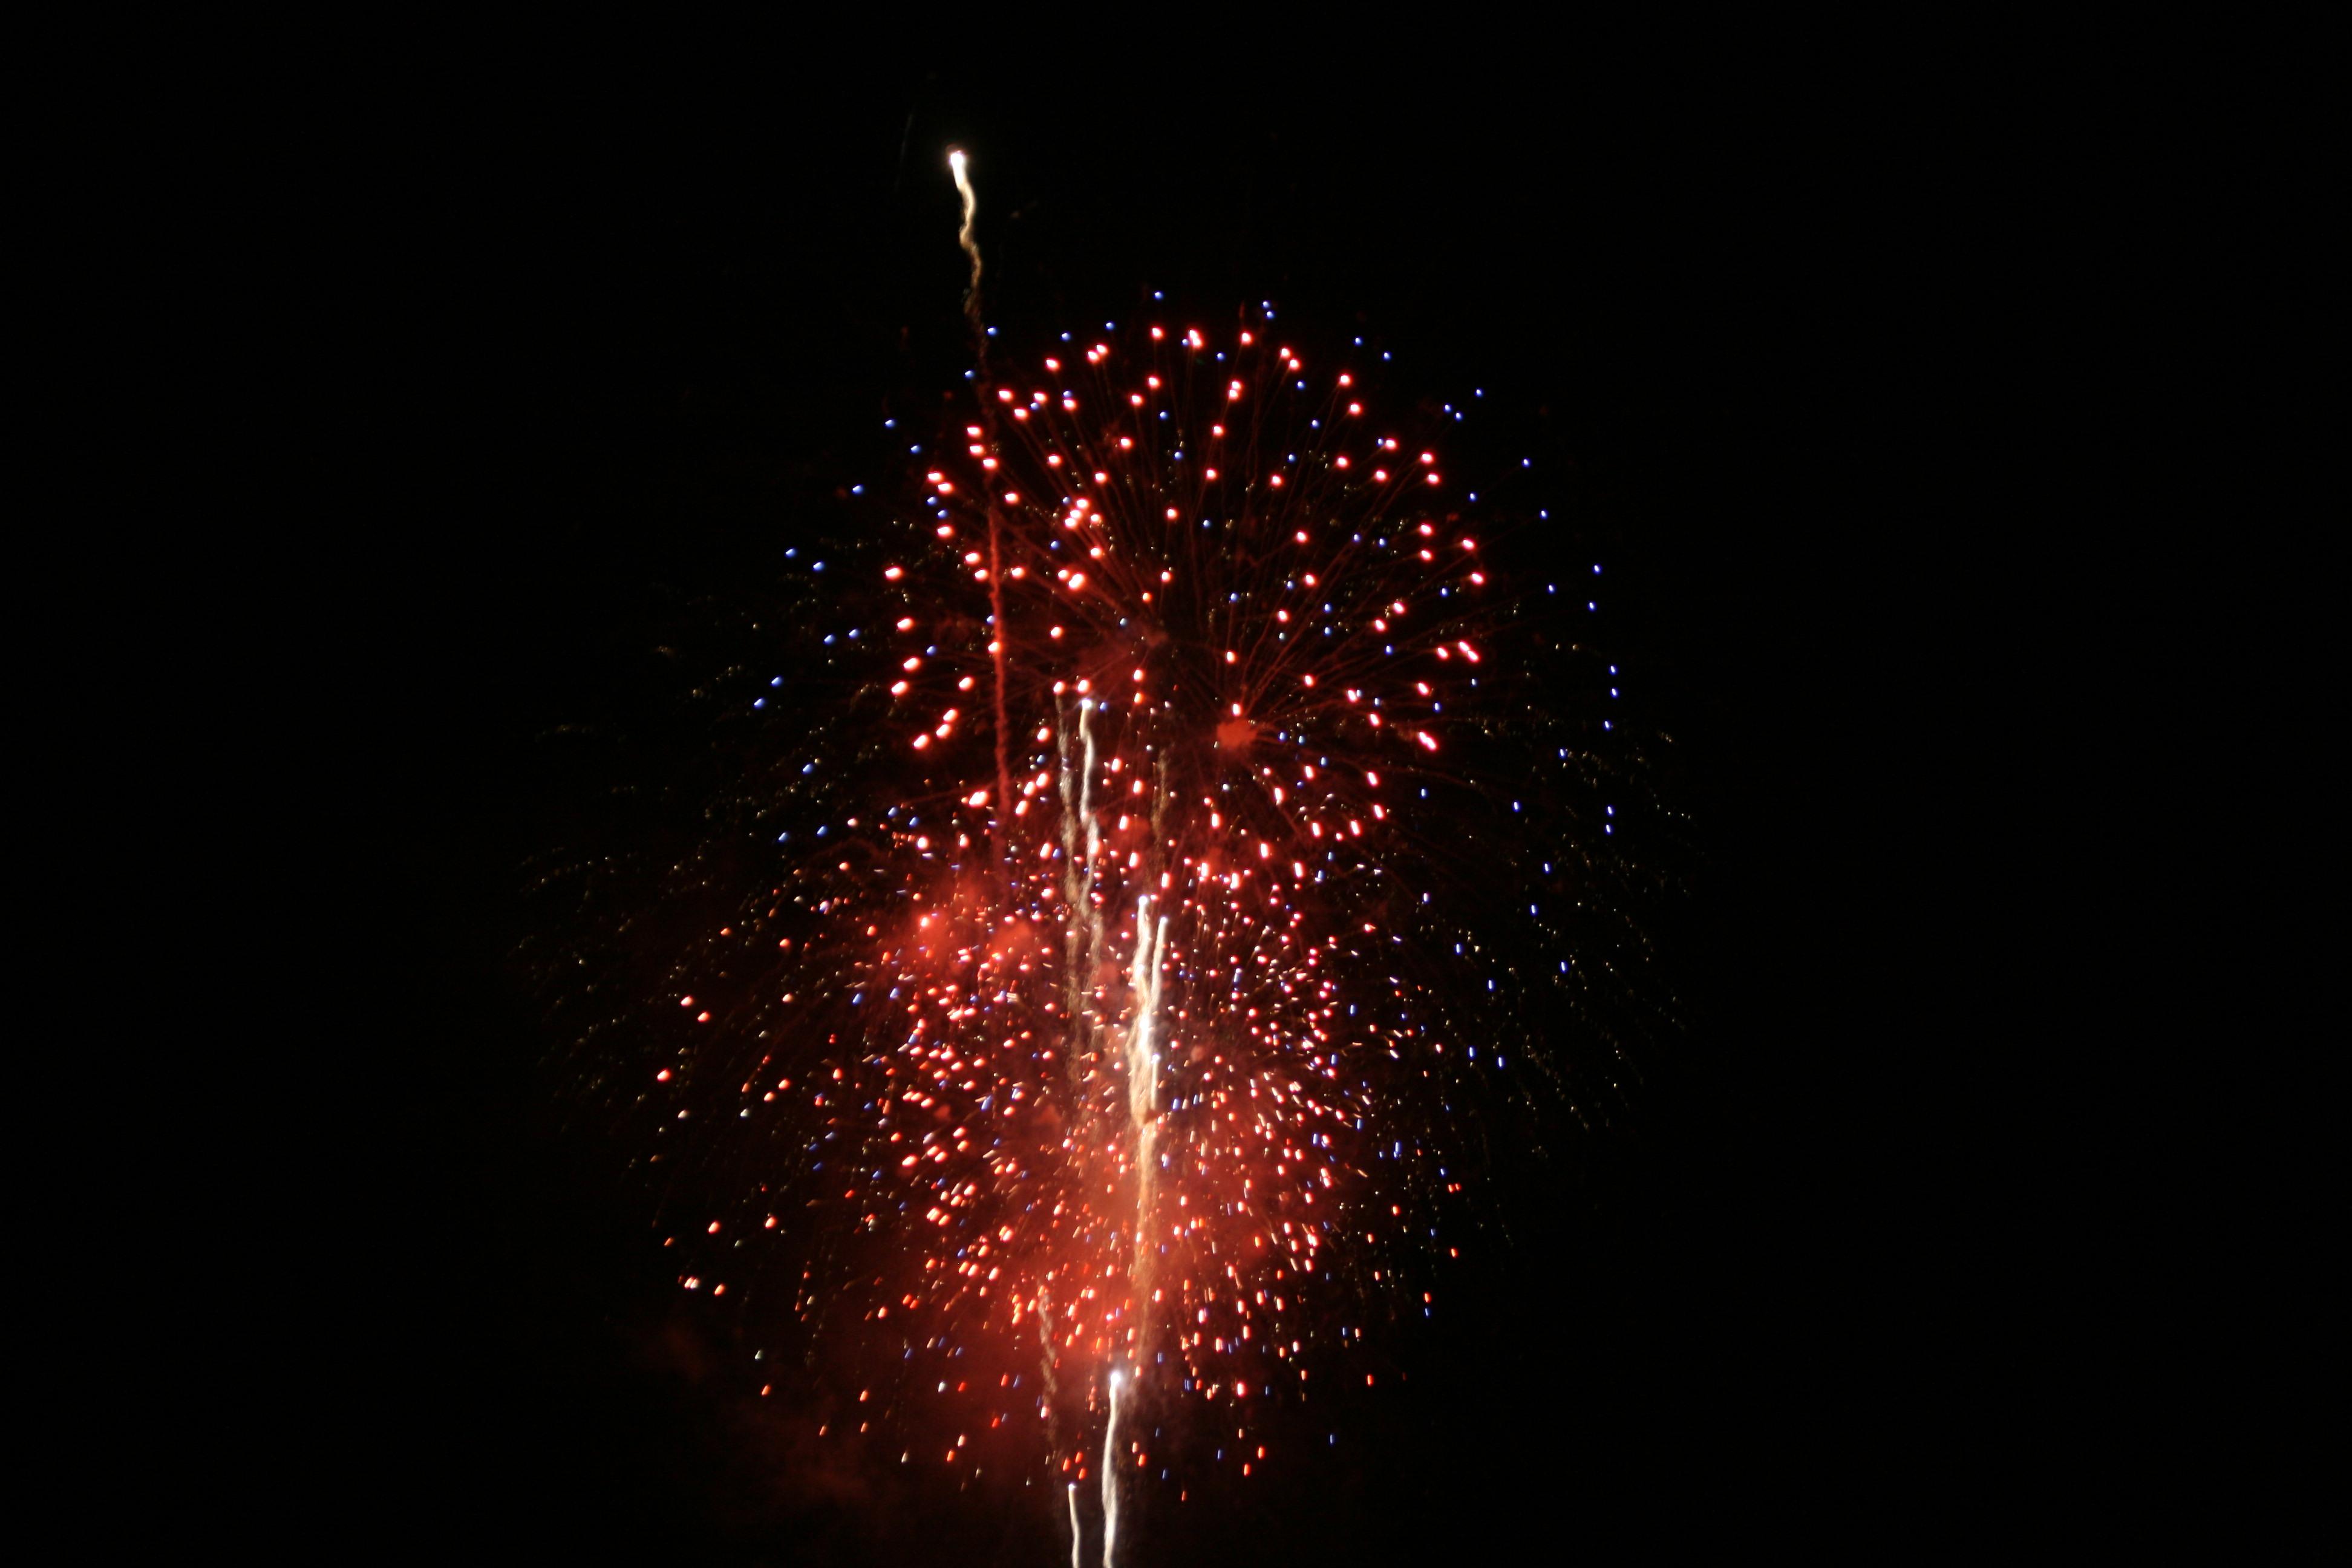 Fireworks Free Vector Art  12053 Free Downloads  Vecteezy